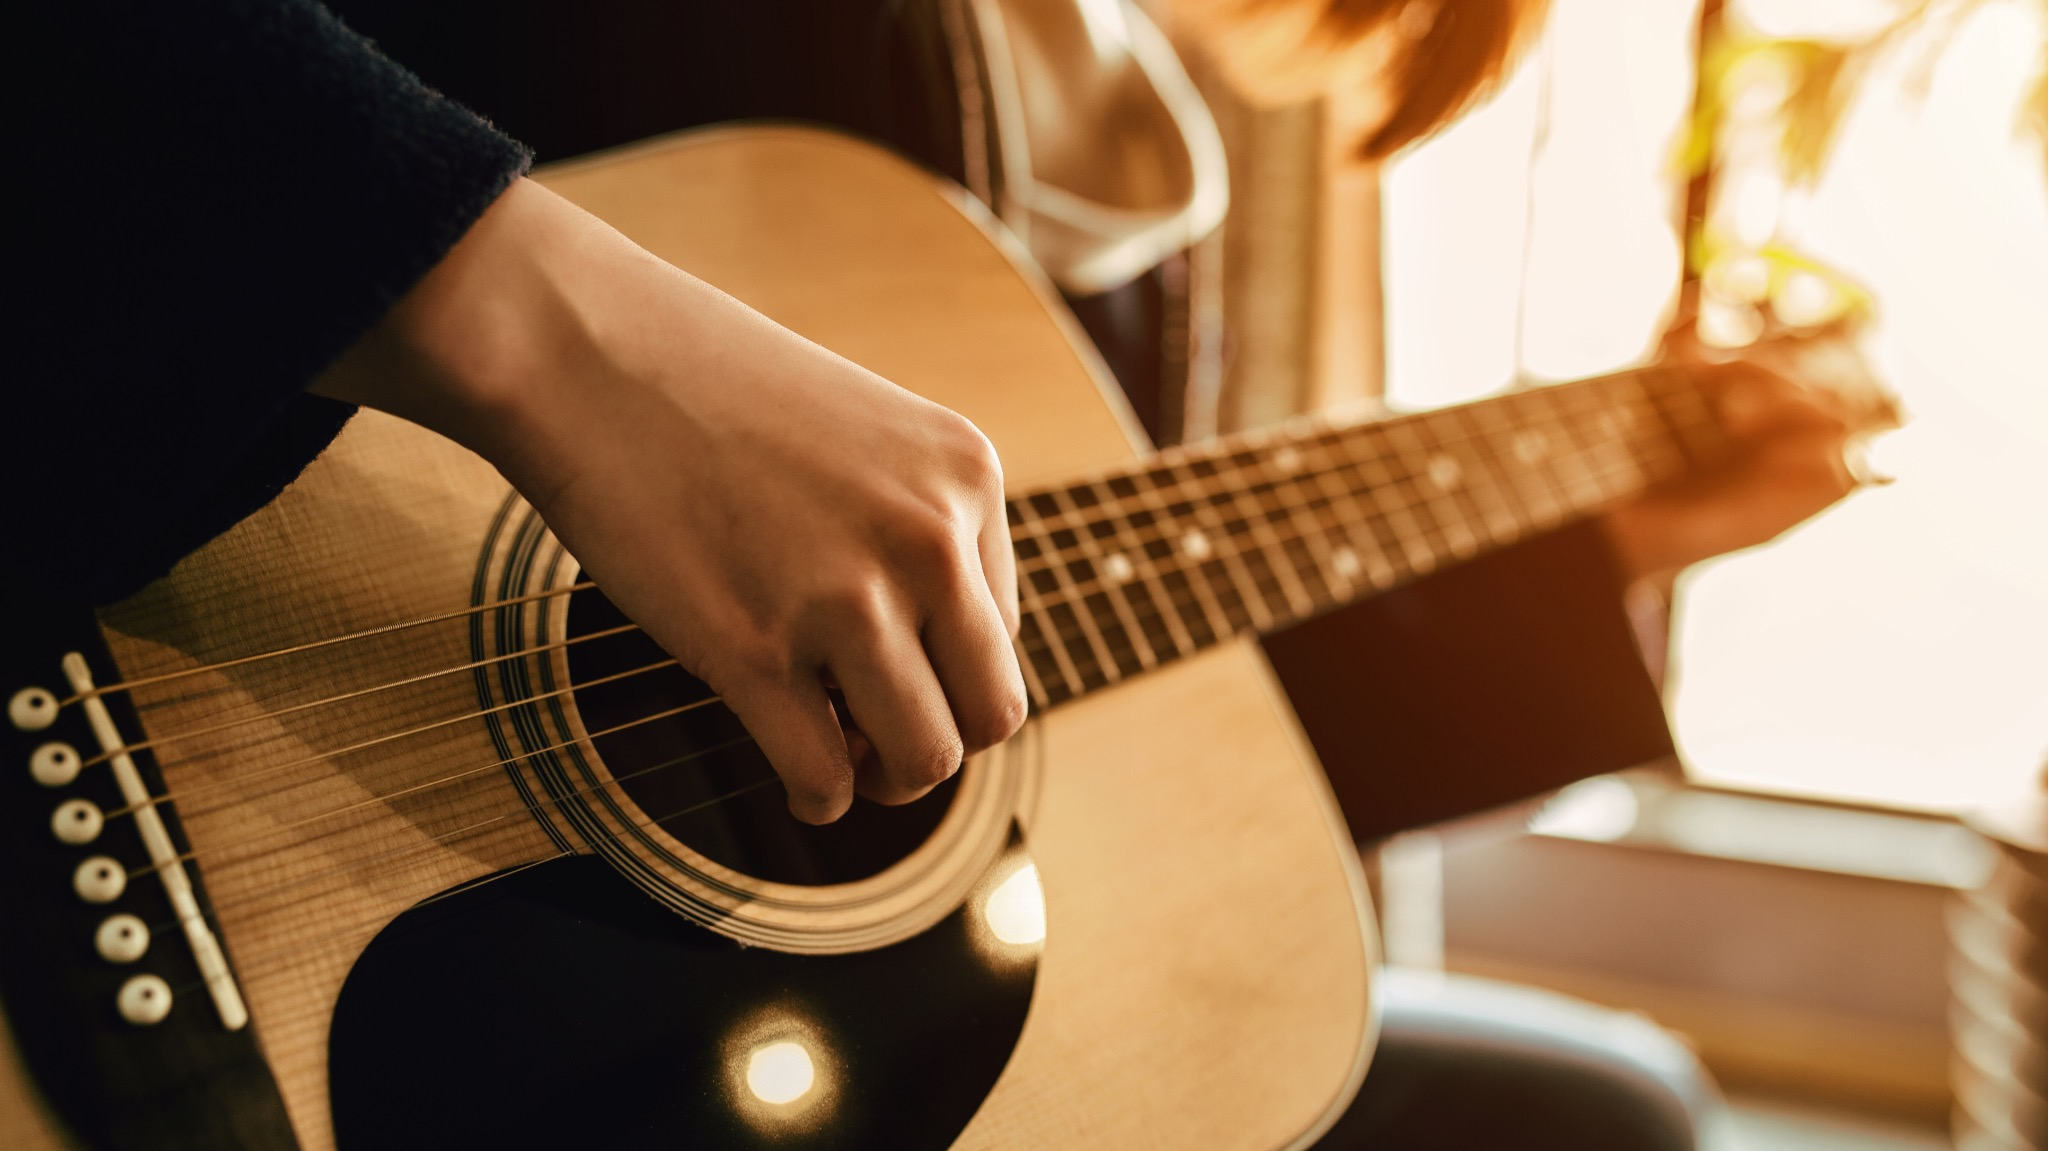 Kim: Guitar